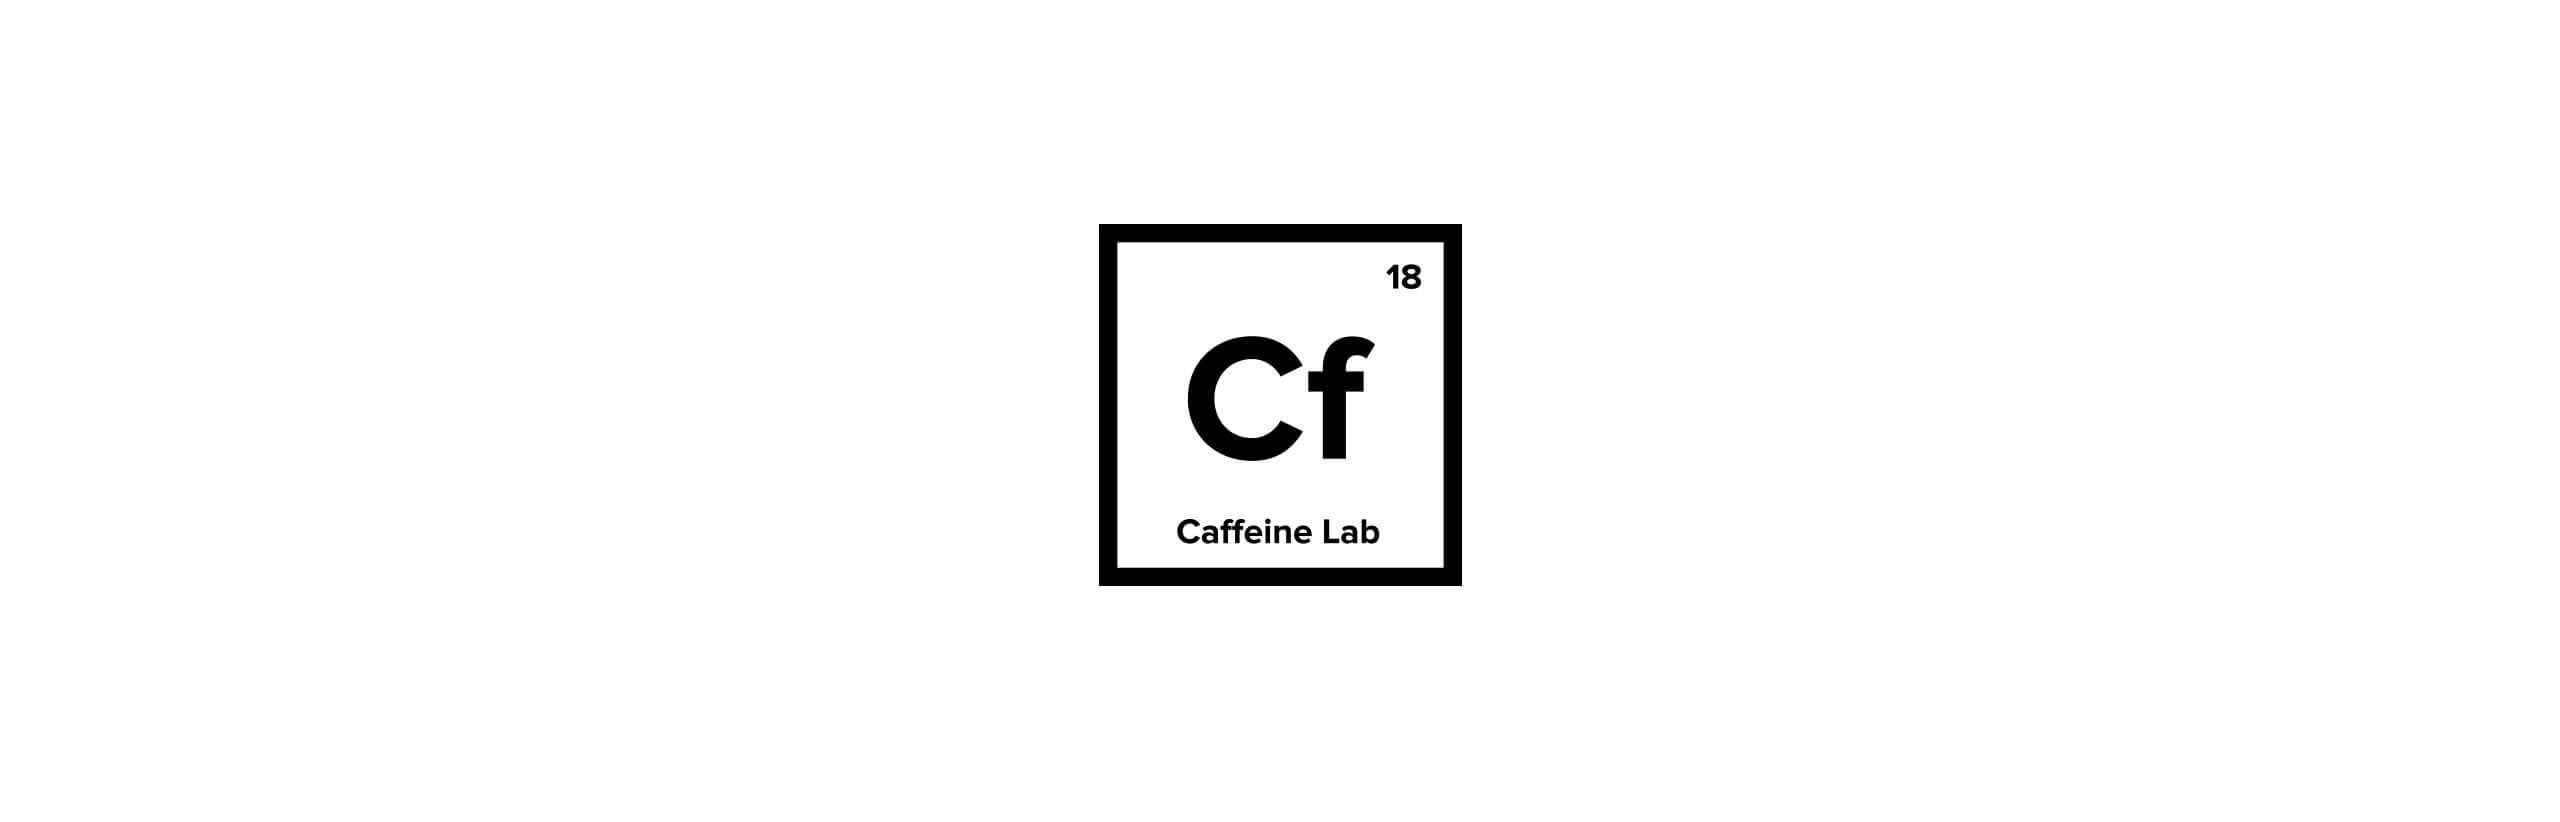 1_Caffeine-Lab_Logo3